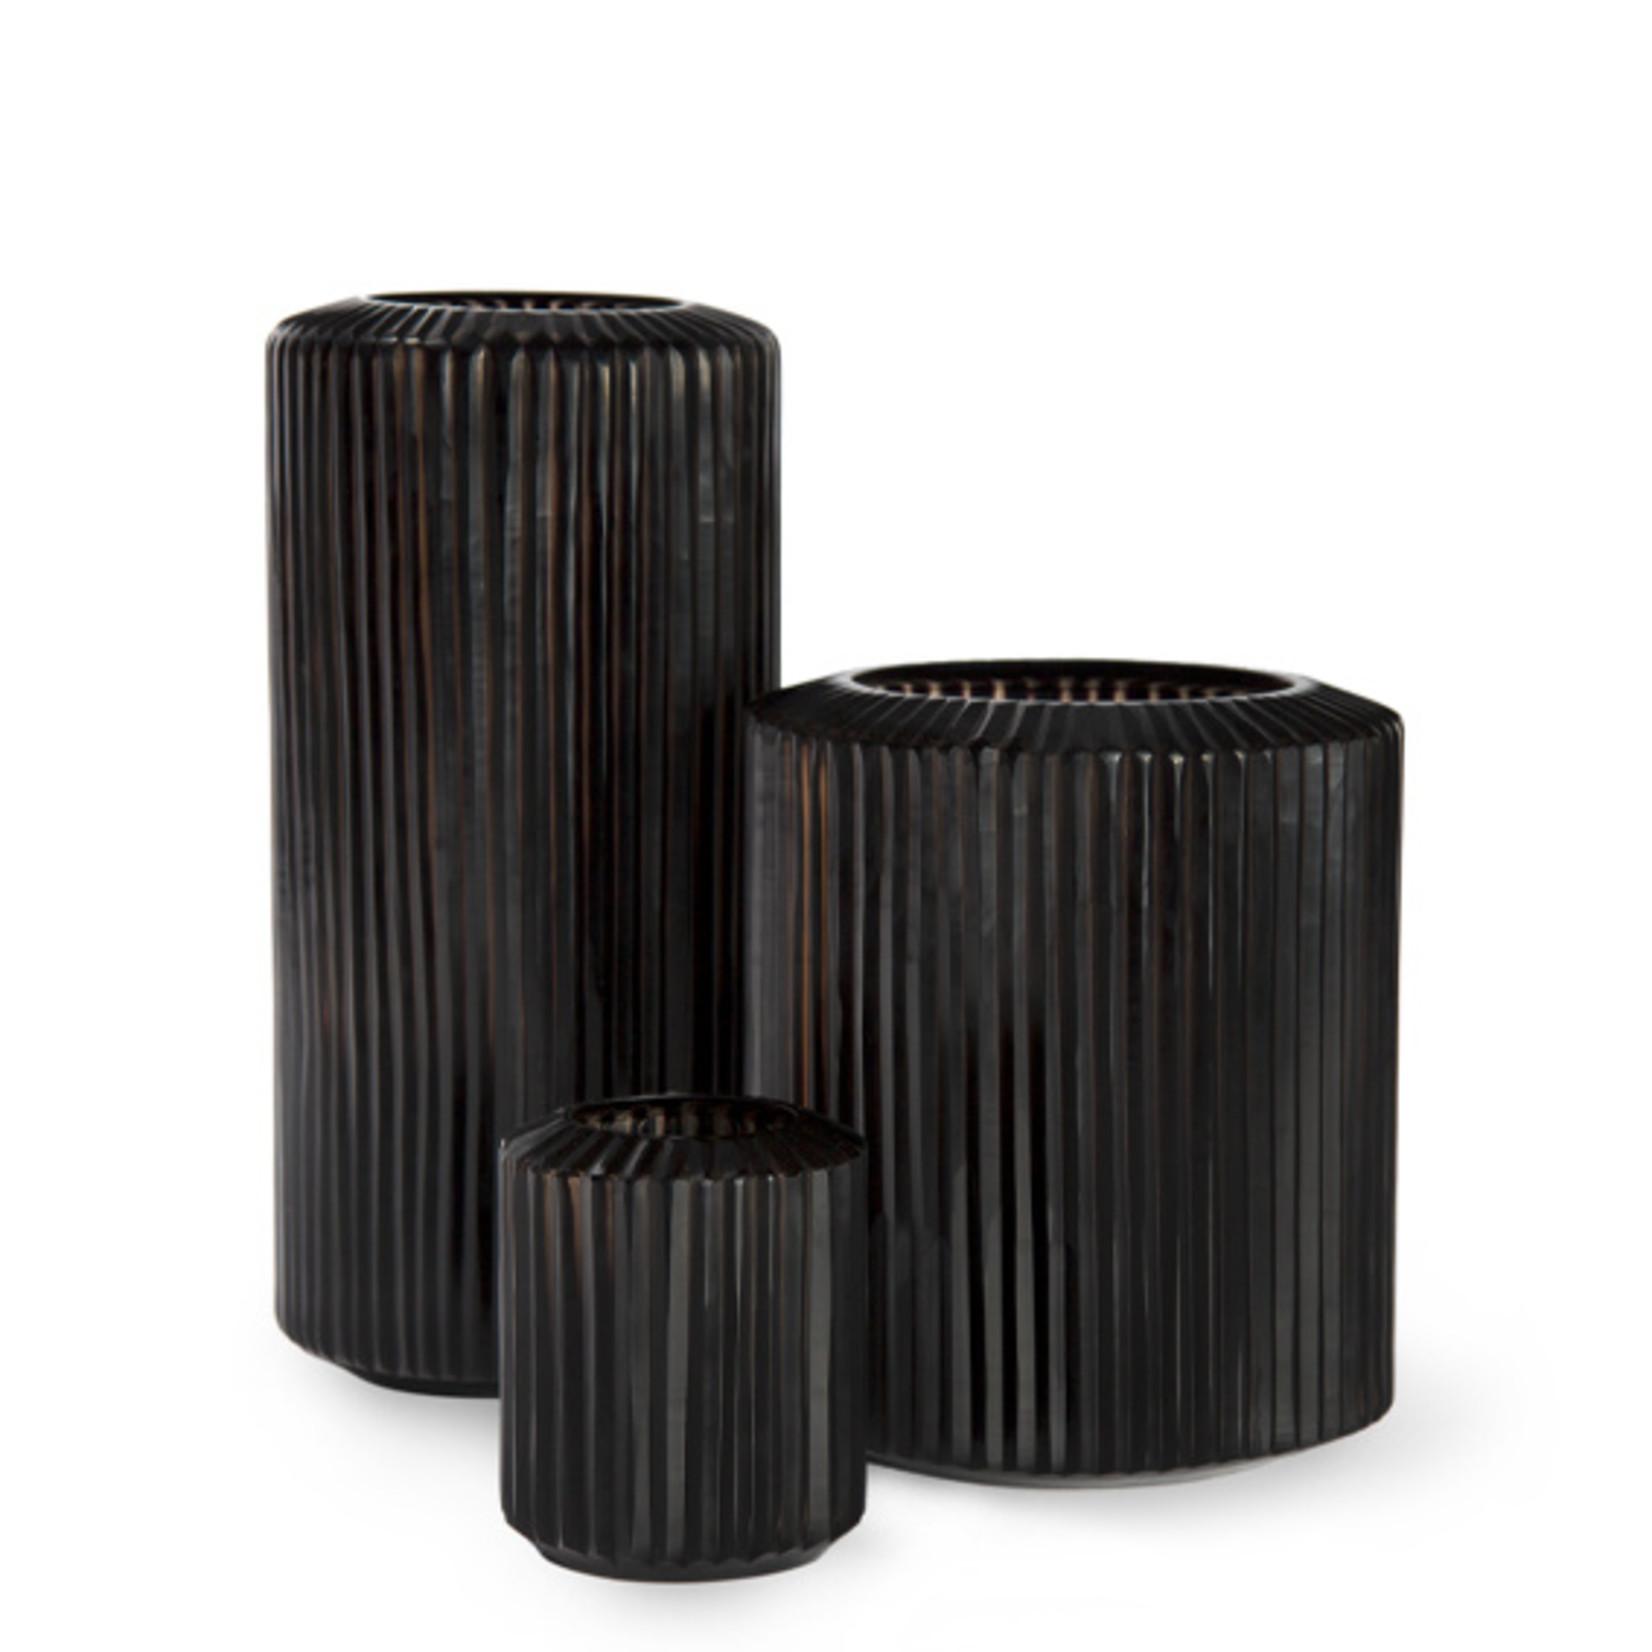 Guaxs Vase Omar L   Smoke Gray / Black